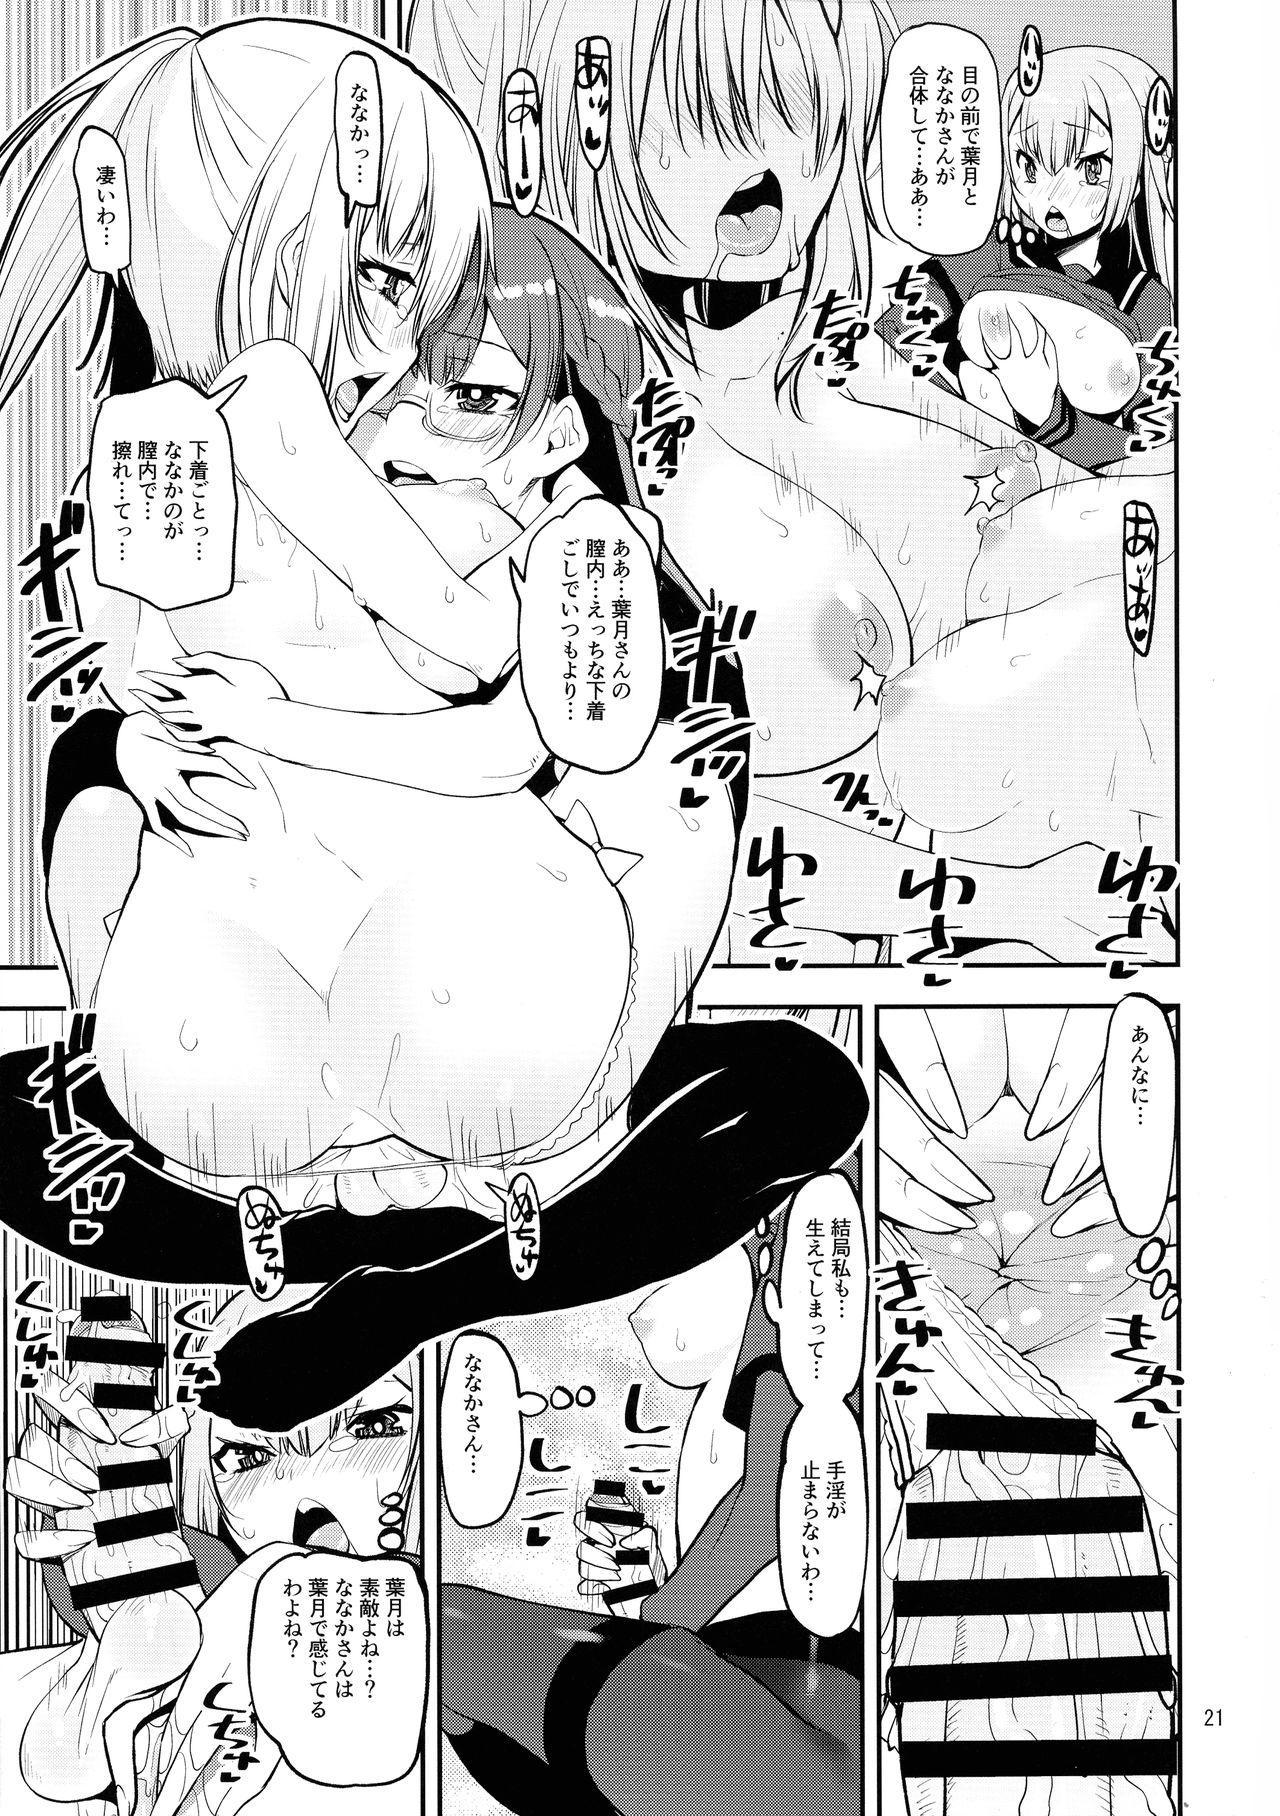 Yusayusa Anekano Sandwich 19